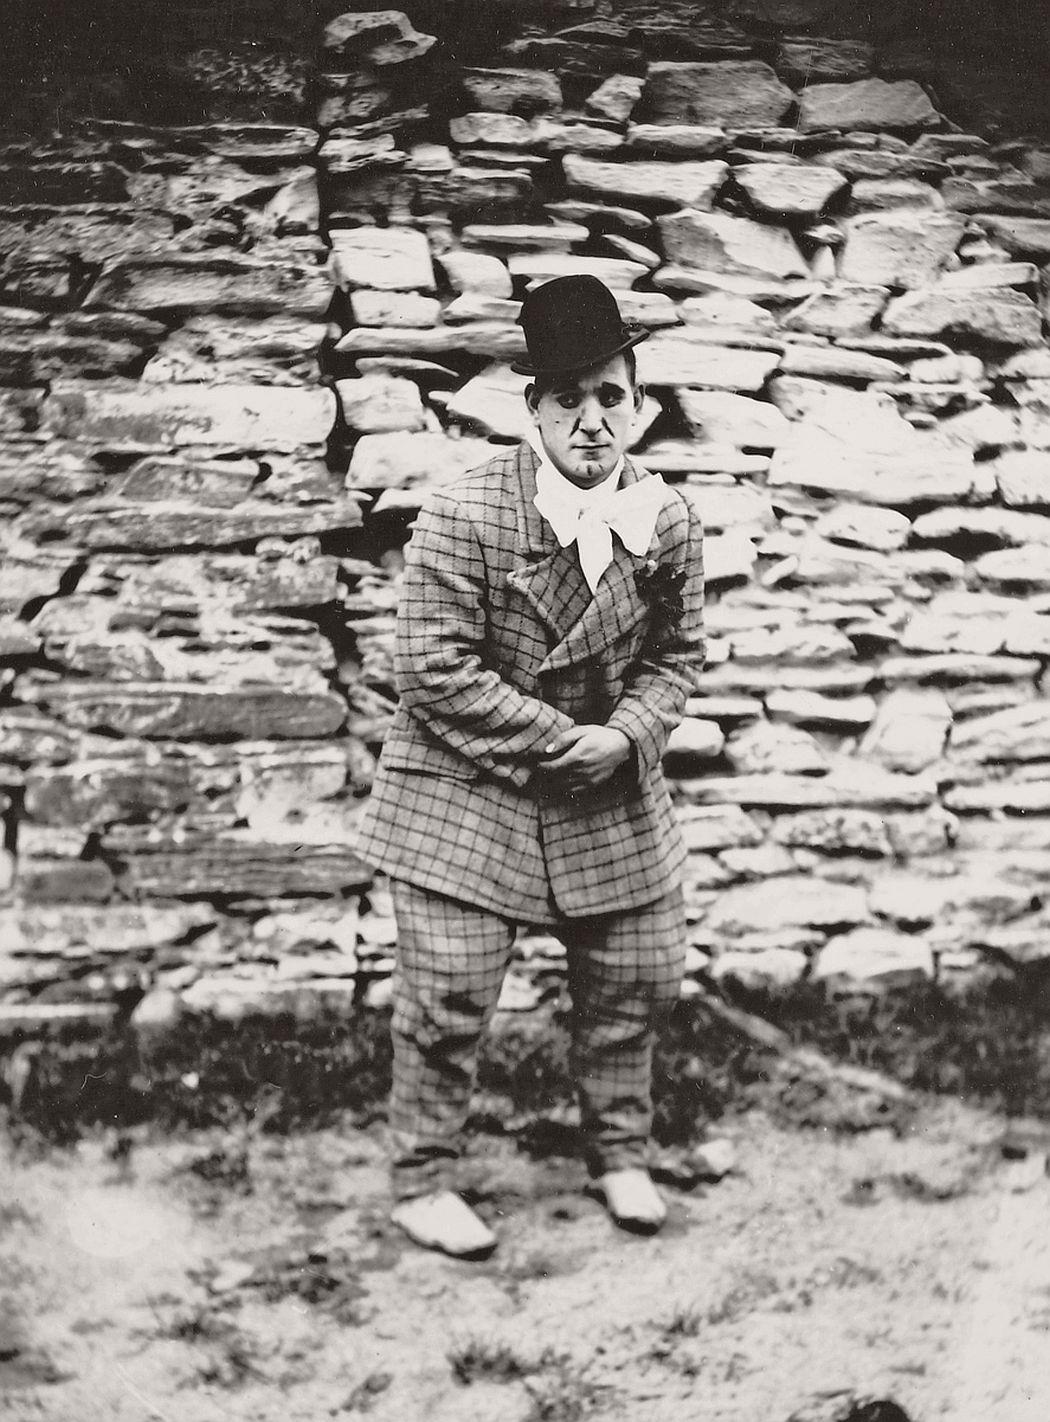 vintage-circus-performers-in-strabane-1910-1911-20